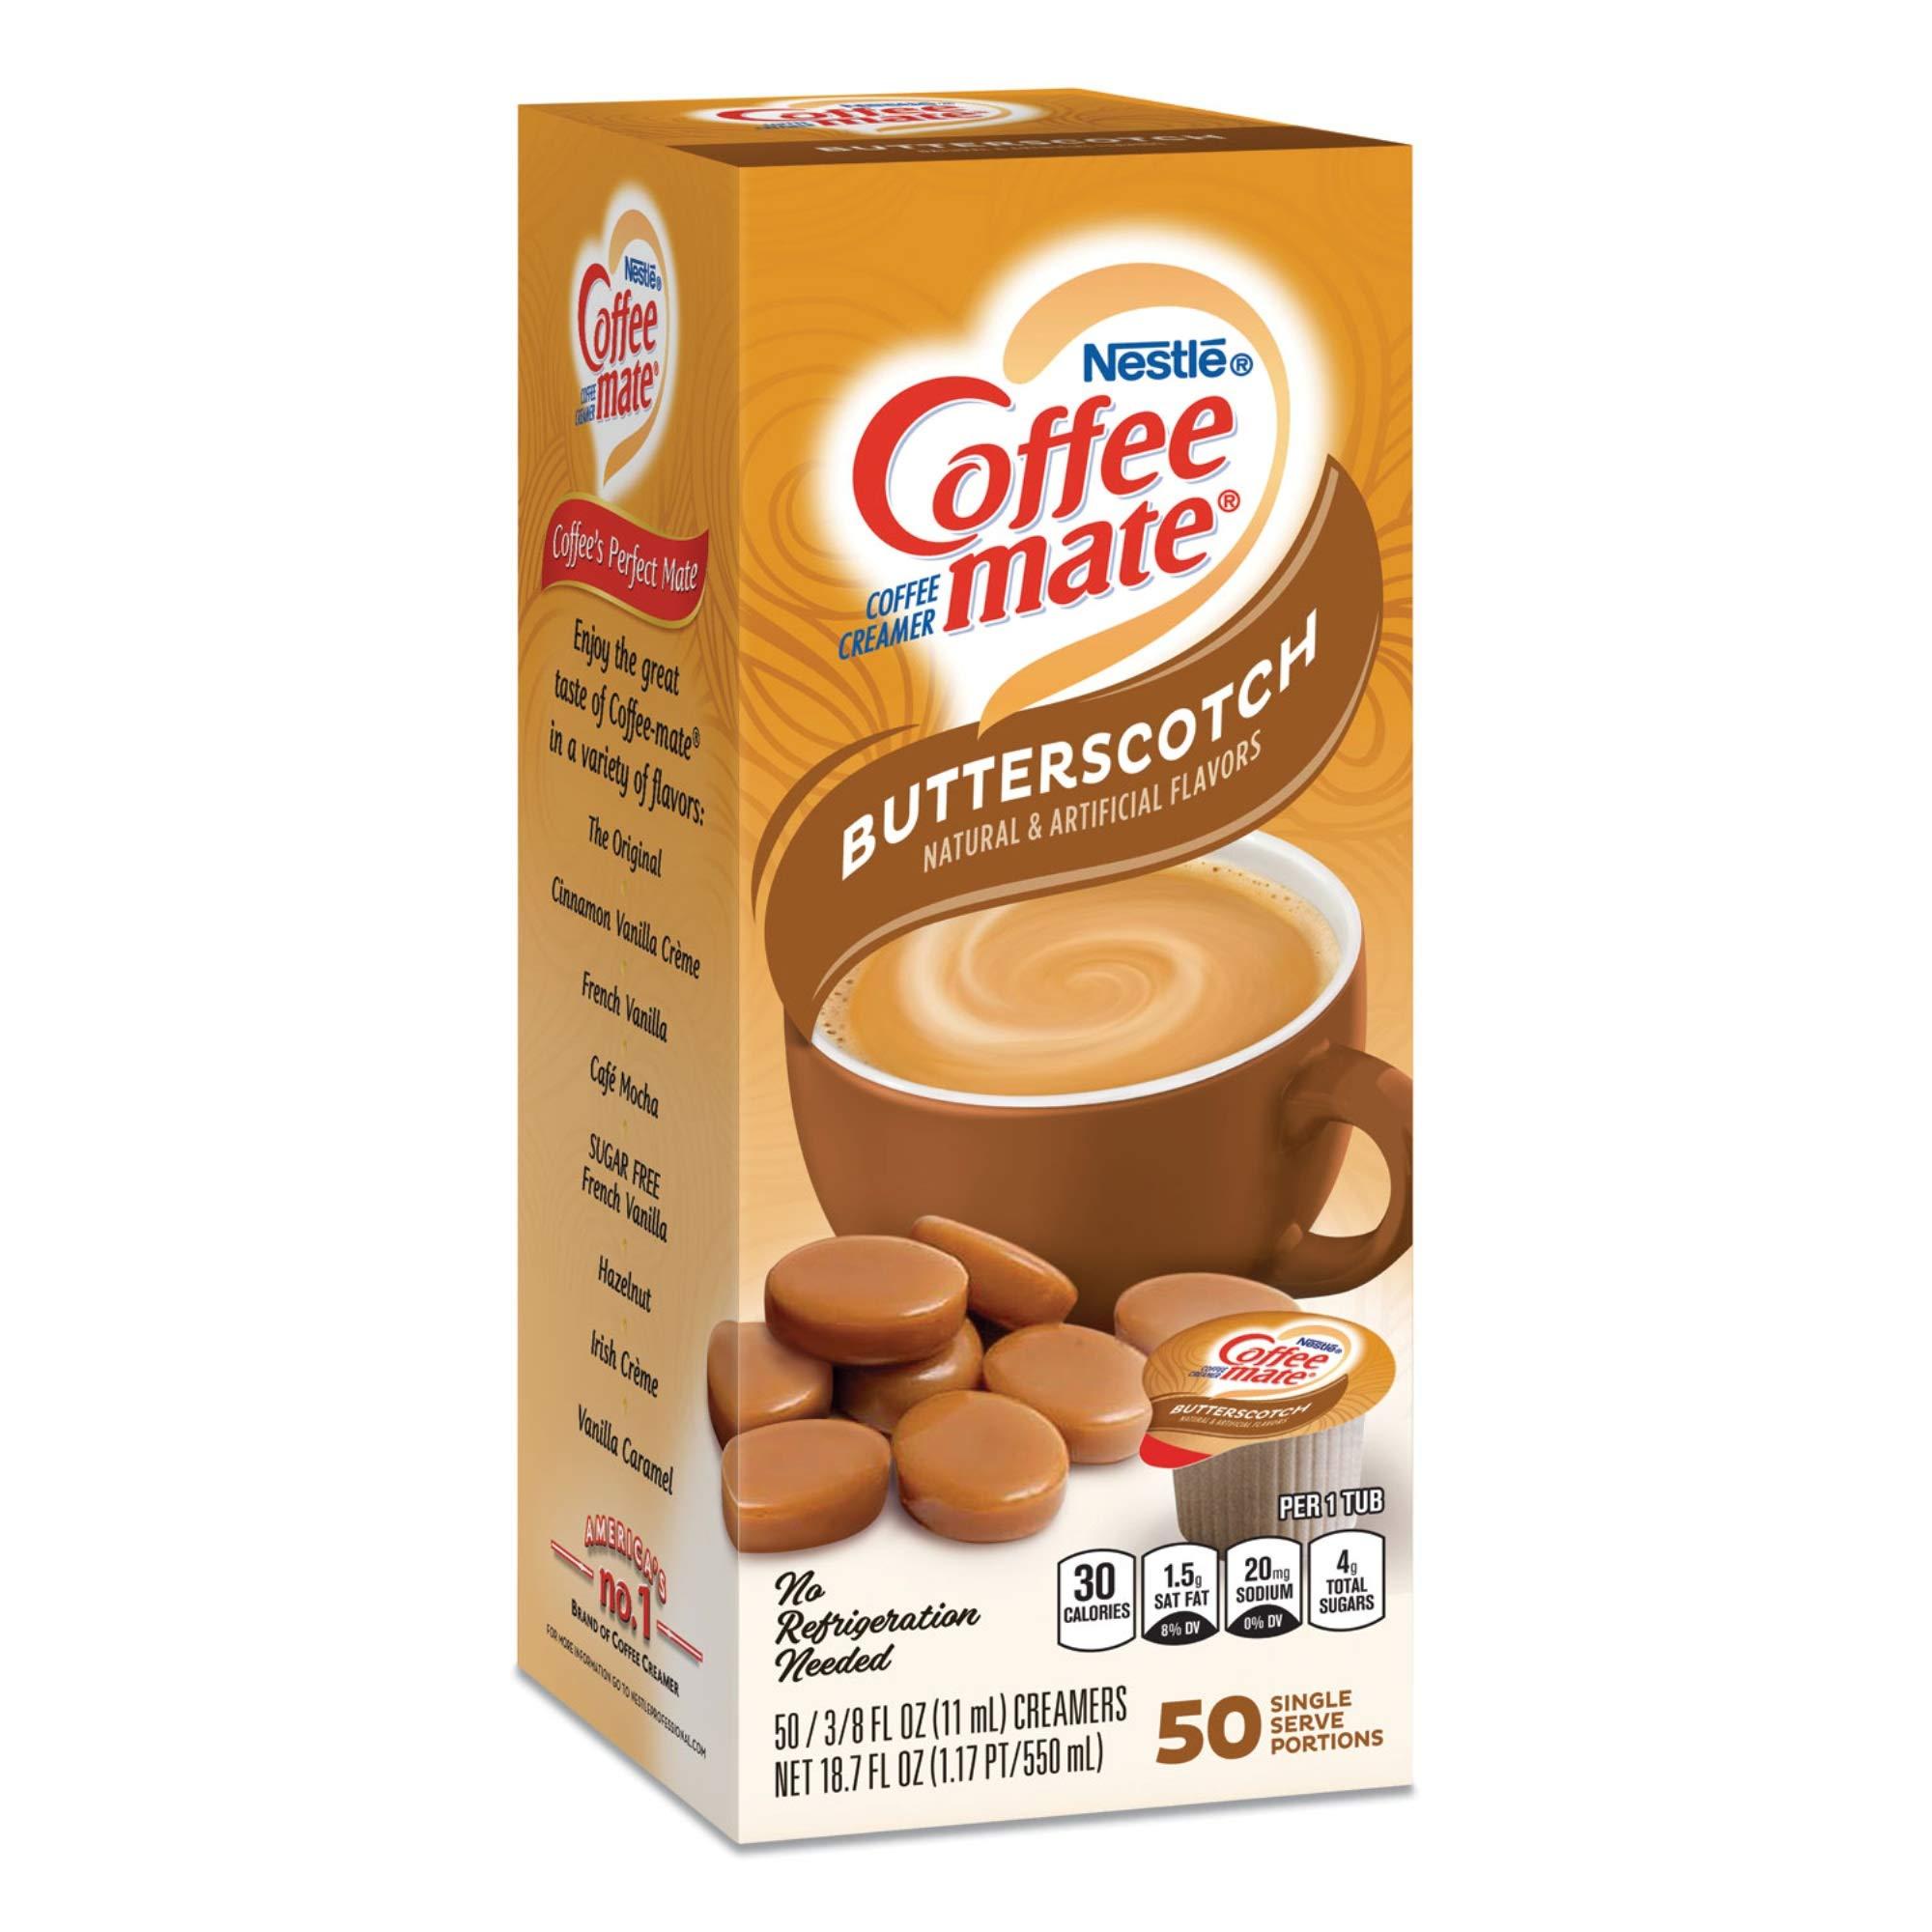 Butterscotch Coffee Creamer - 50 Single Serve Portions (3/8 Oz Each)